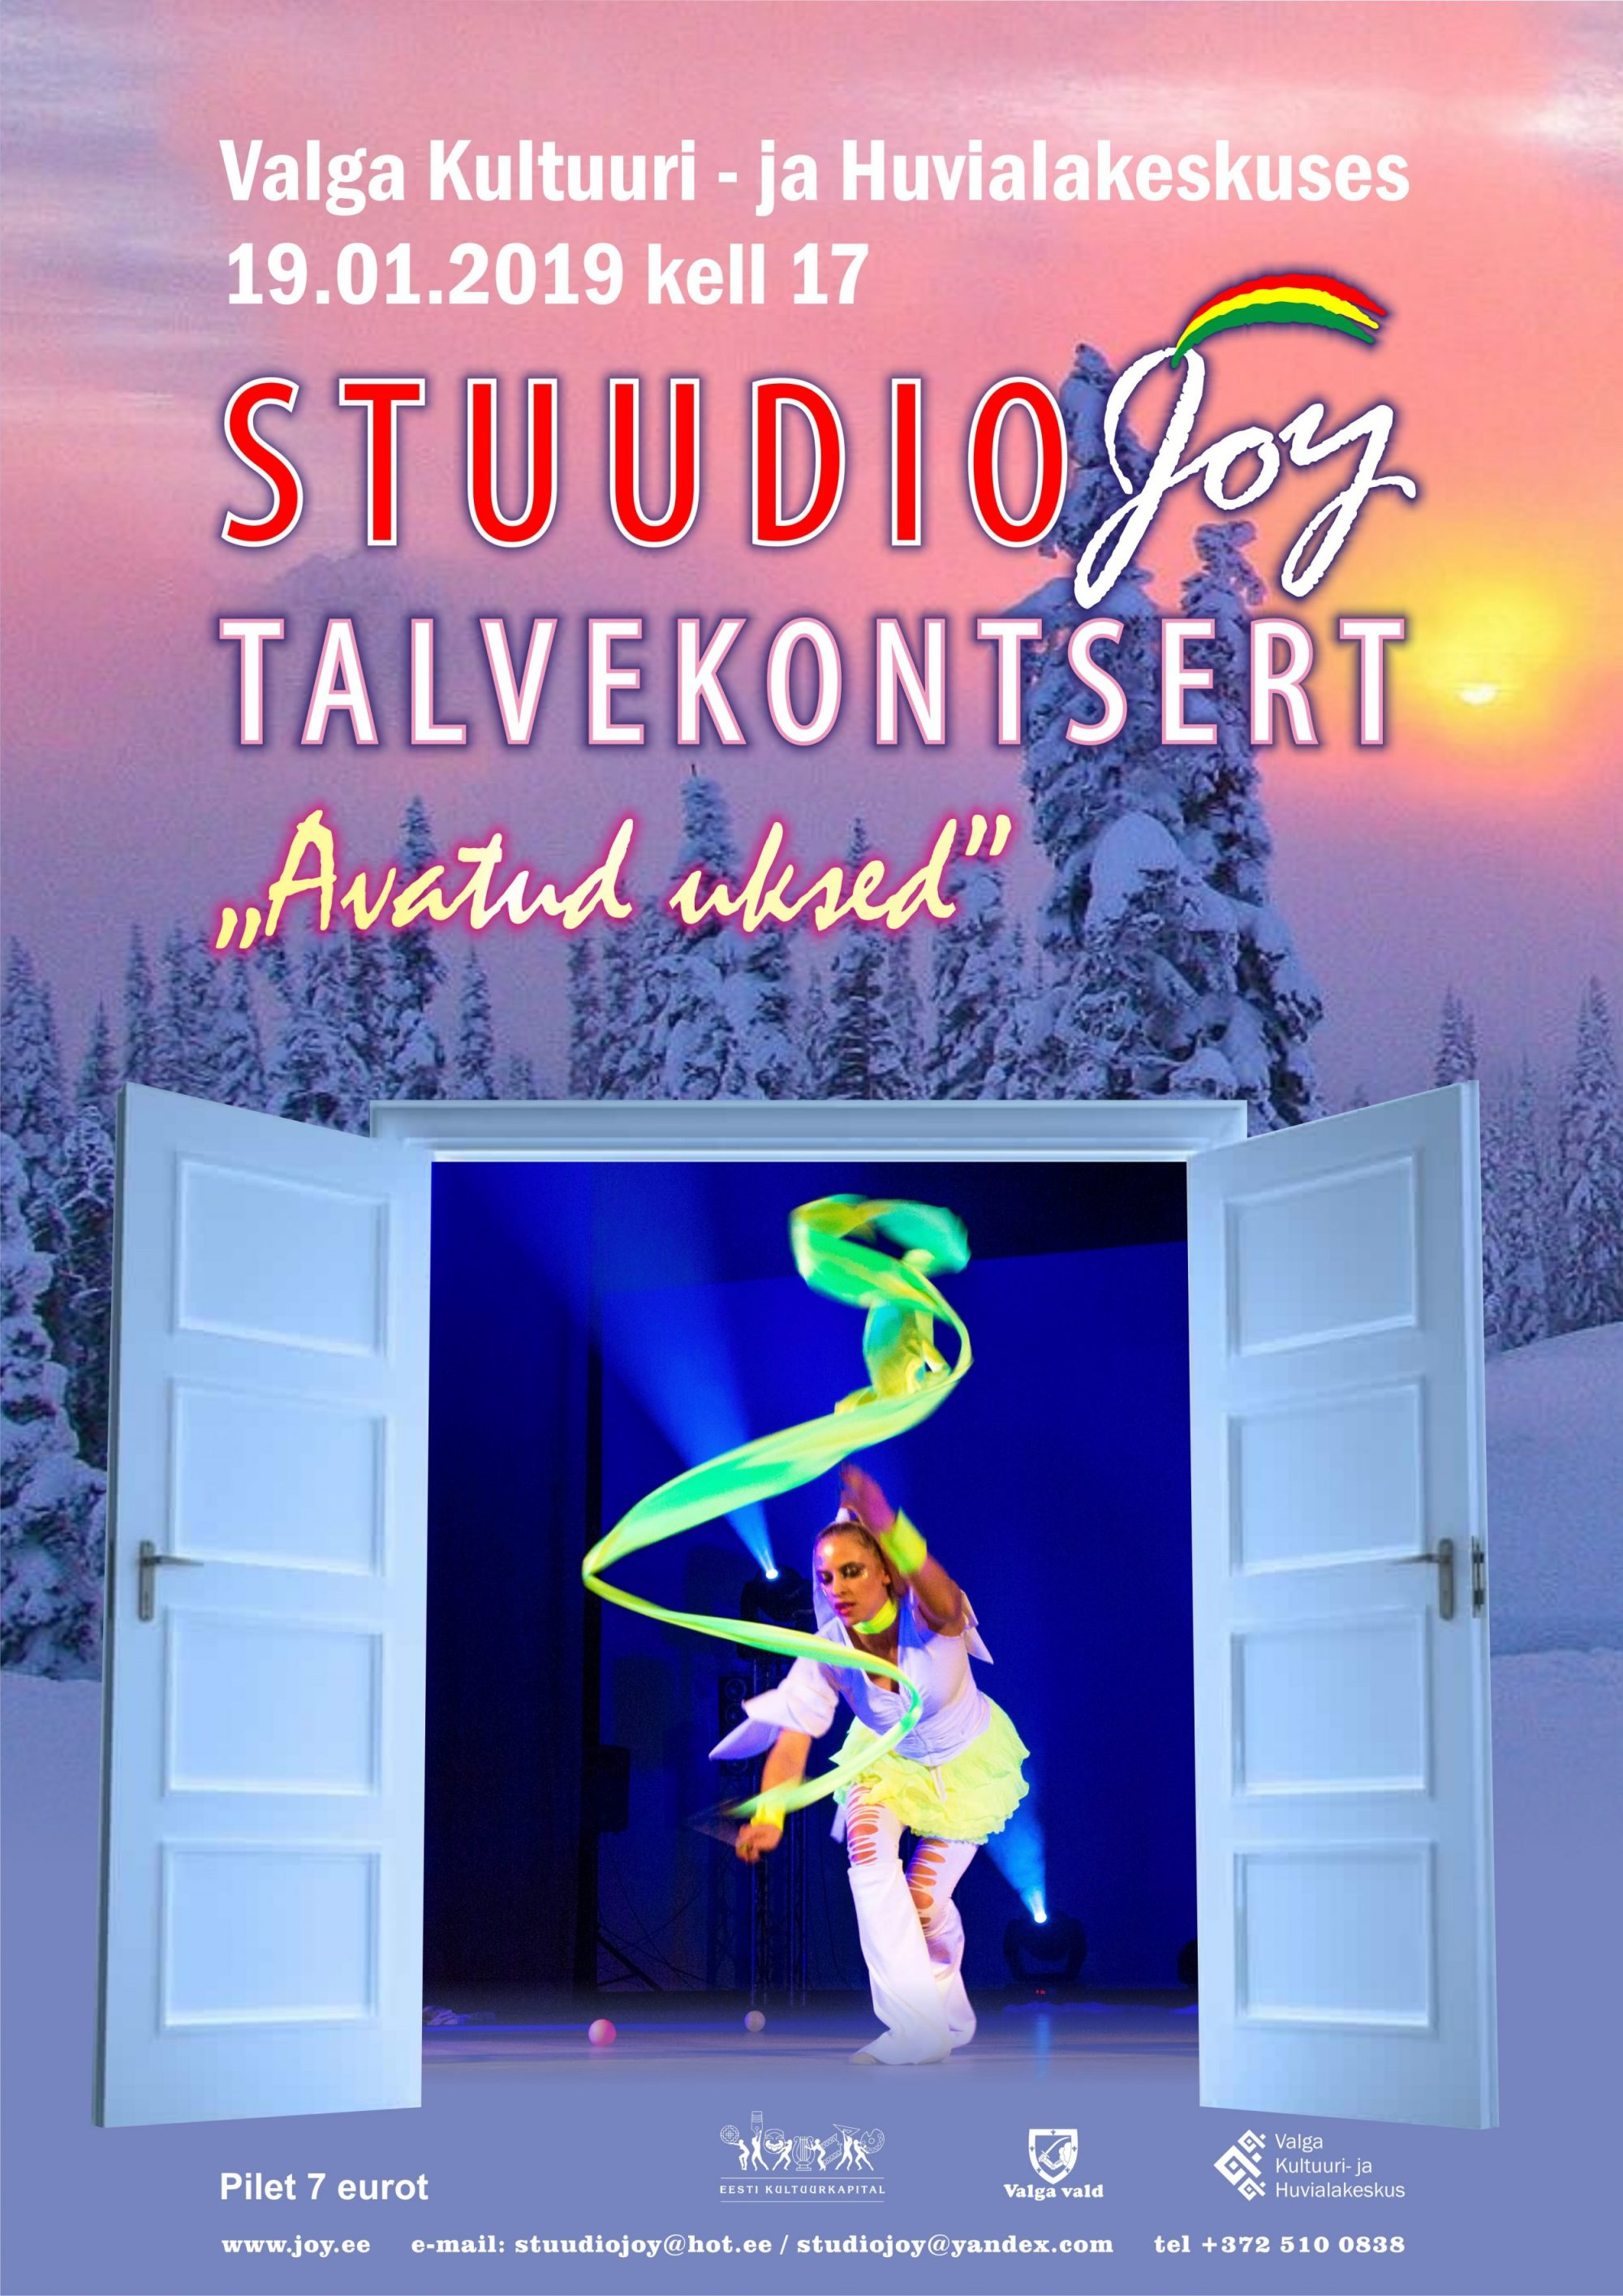 Stuudio JOY talve kontsert 2019